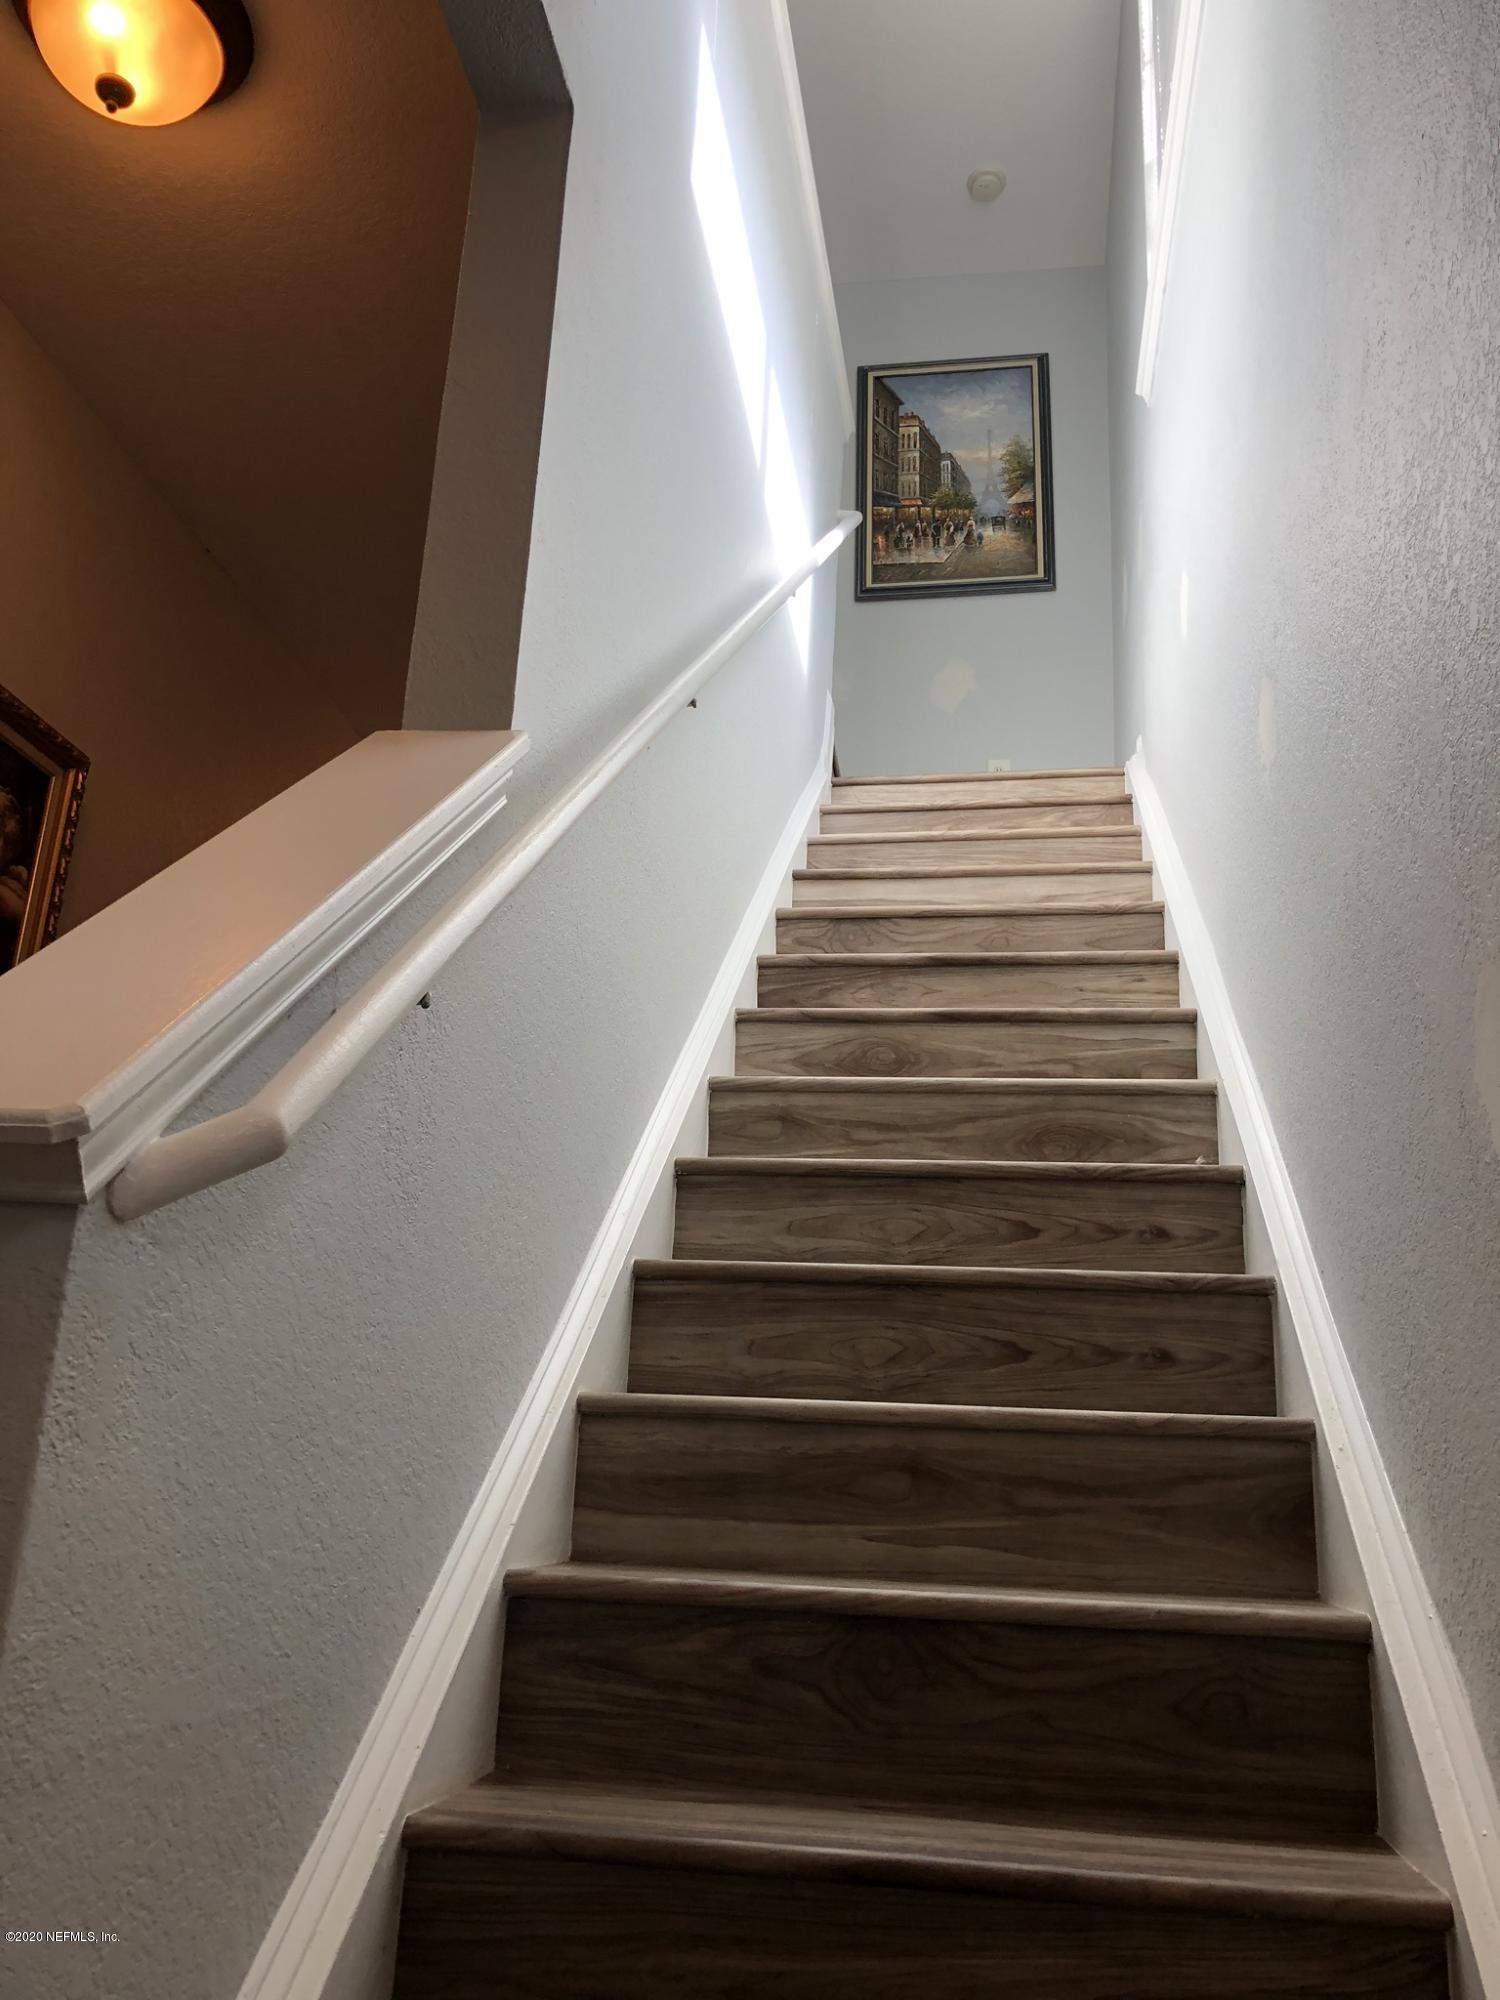 10200 BELLE RIVE, JACKSONVILLE, FLORIDA 32256, 3 Bedrooms Bedrooms, ,2 BathroomsBathrooms,Residential,For sale,BELLE RIVE,1081654